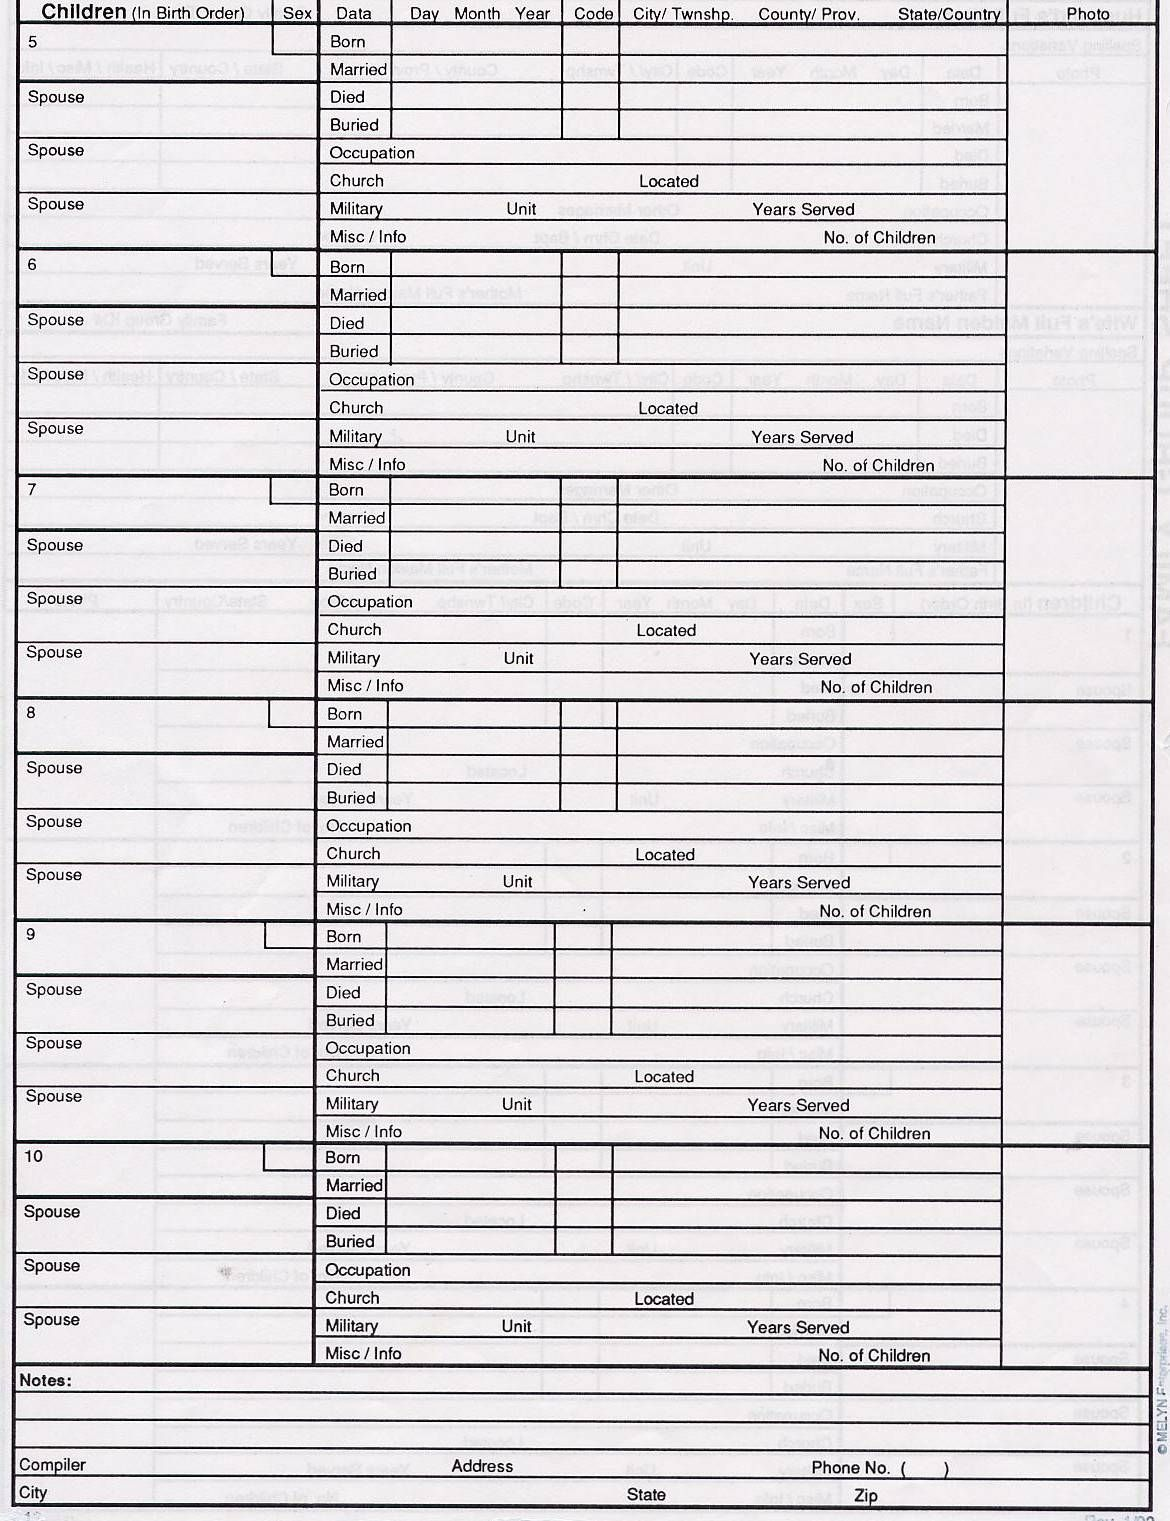 Family Group Sheet No 2.jpg 1,170×1,521 pixels | family tree ...